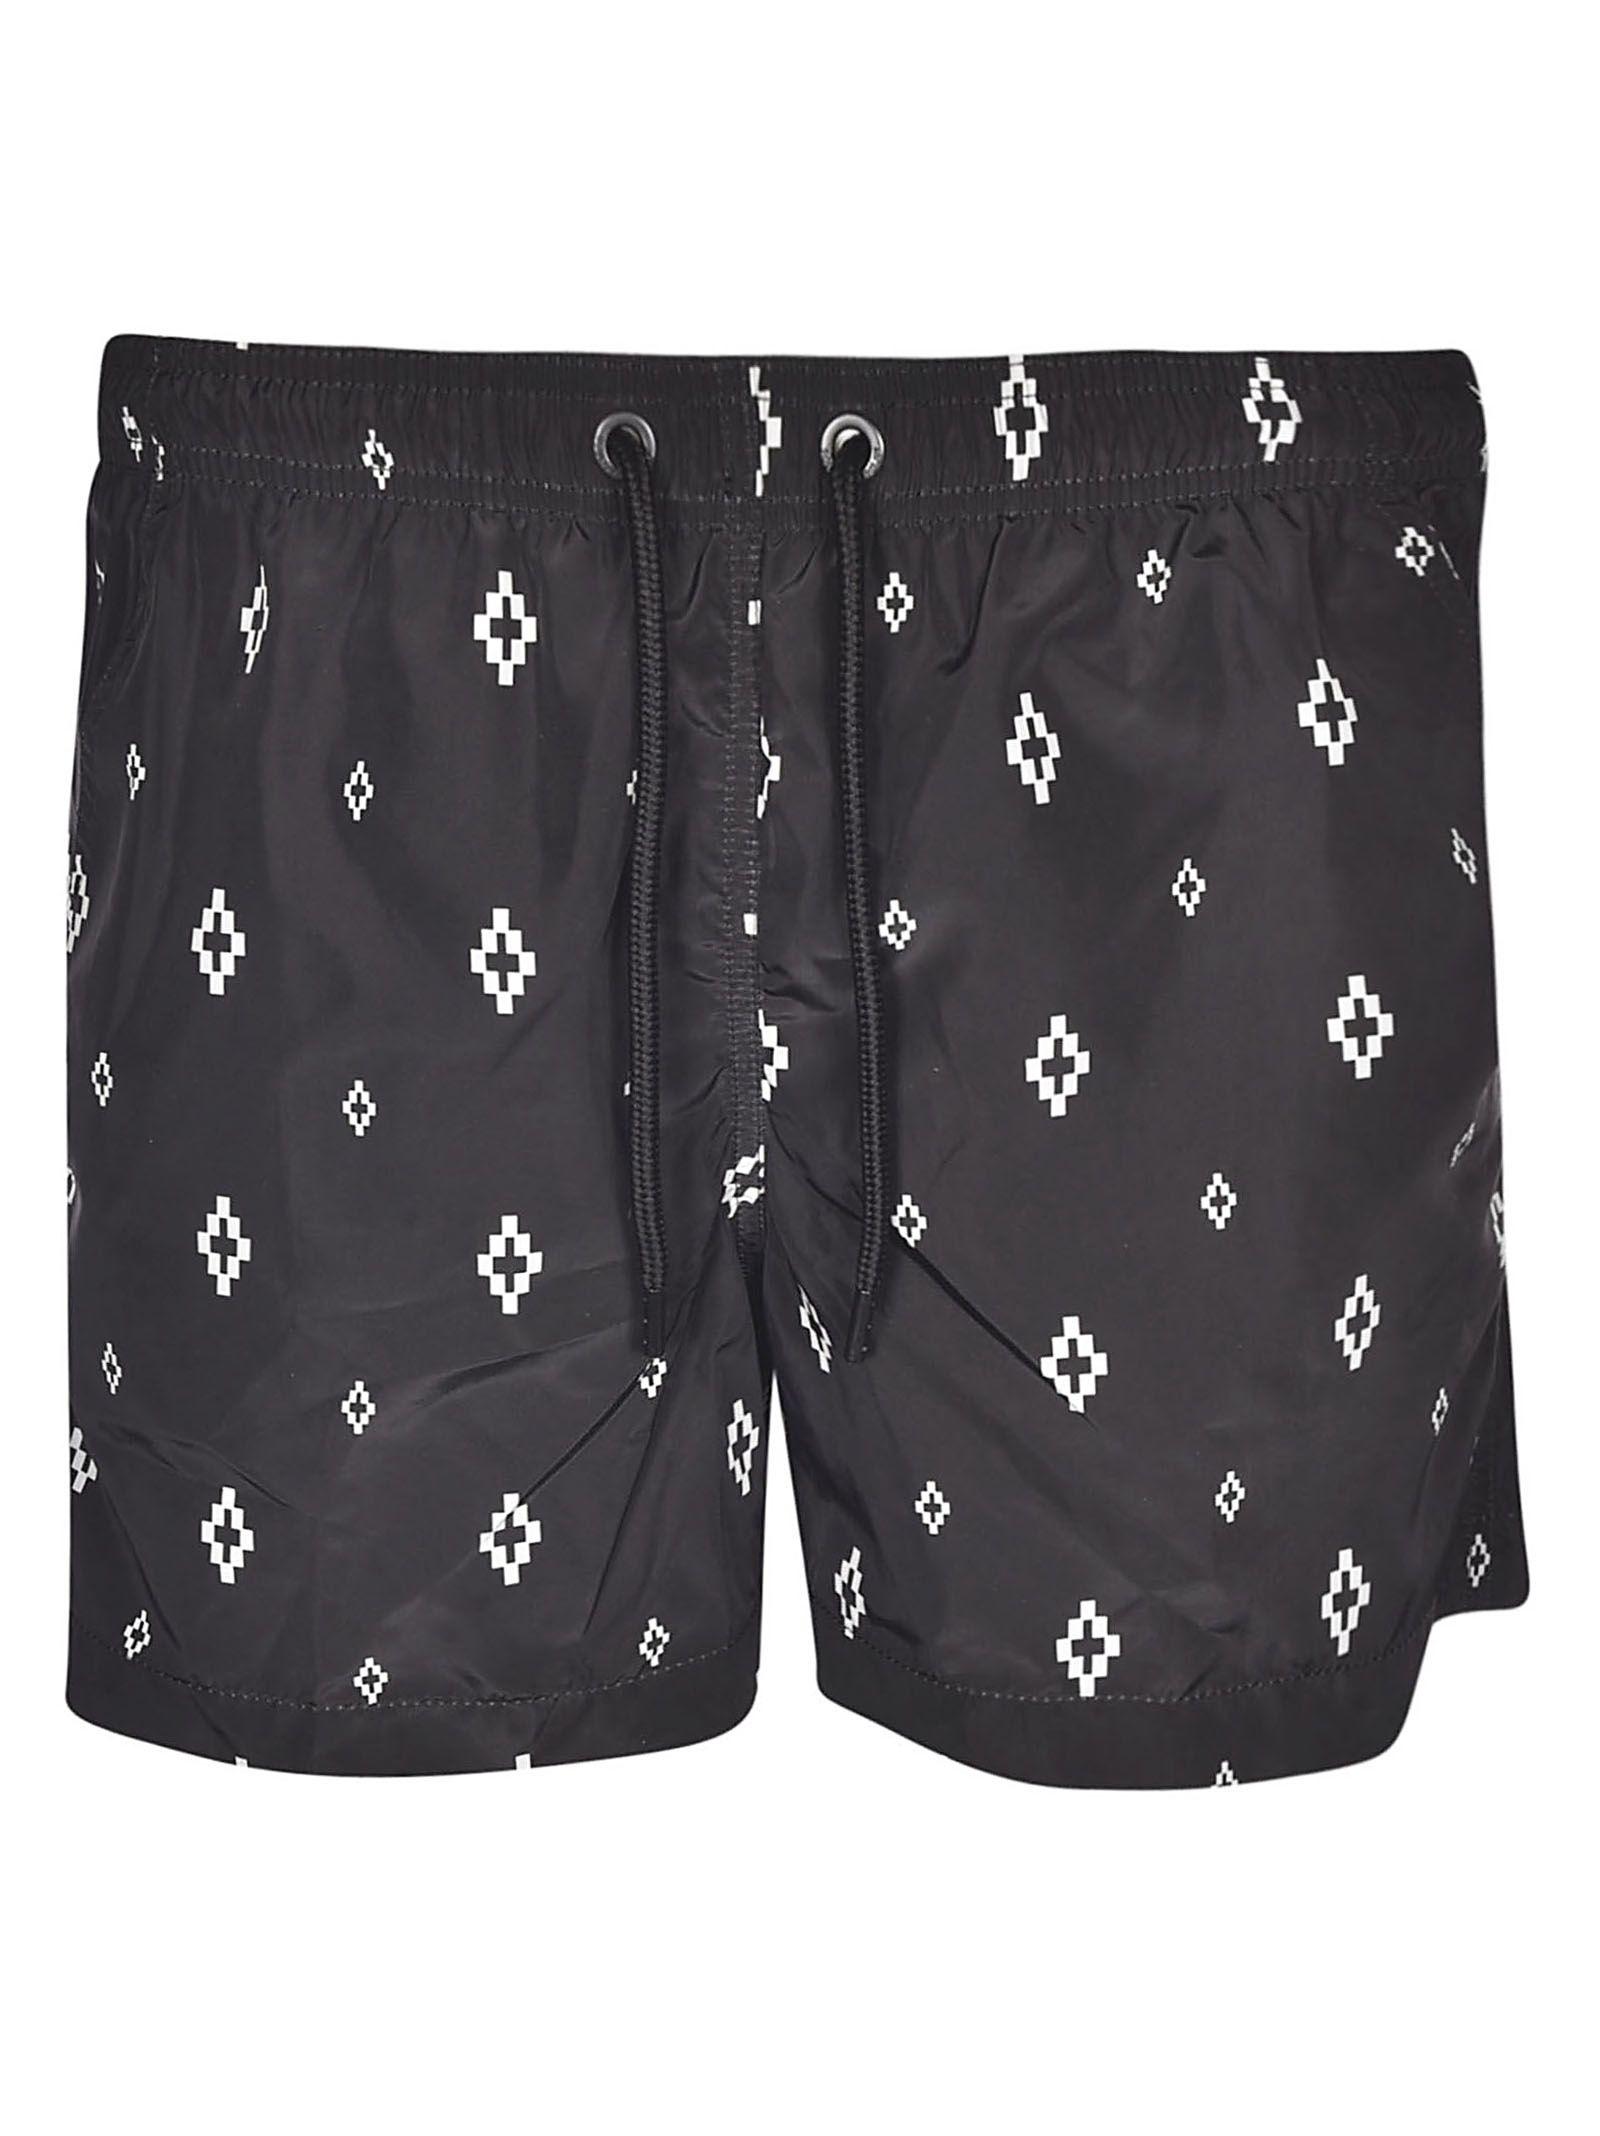 565287d775 Marcelo Burlon Marcelo Burlon Logo Swim Shorts - Basic - 10836682 ...